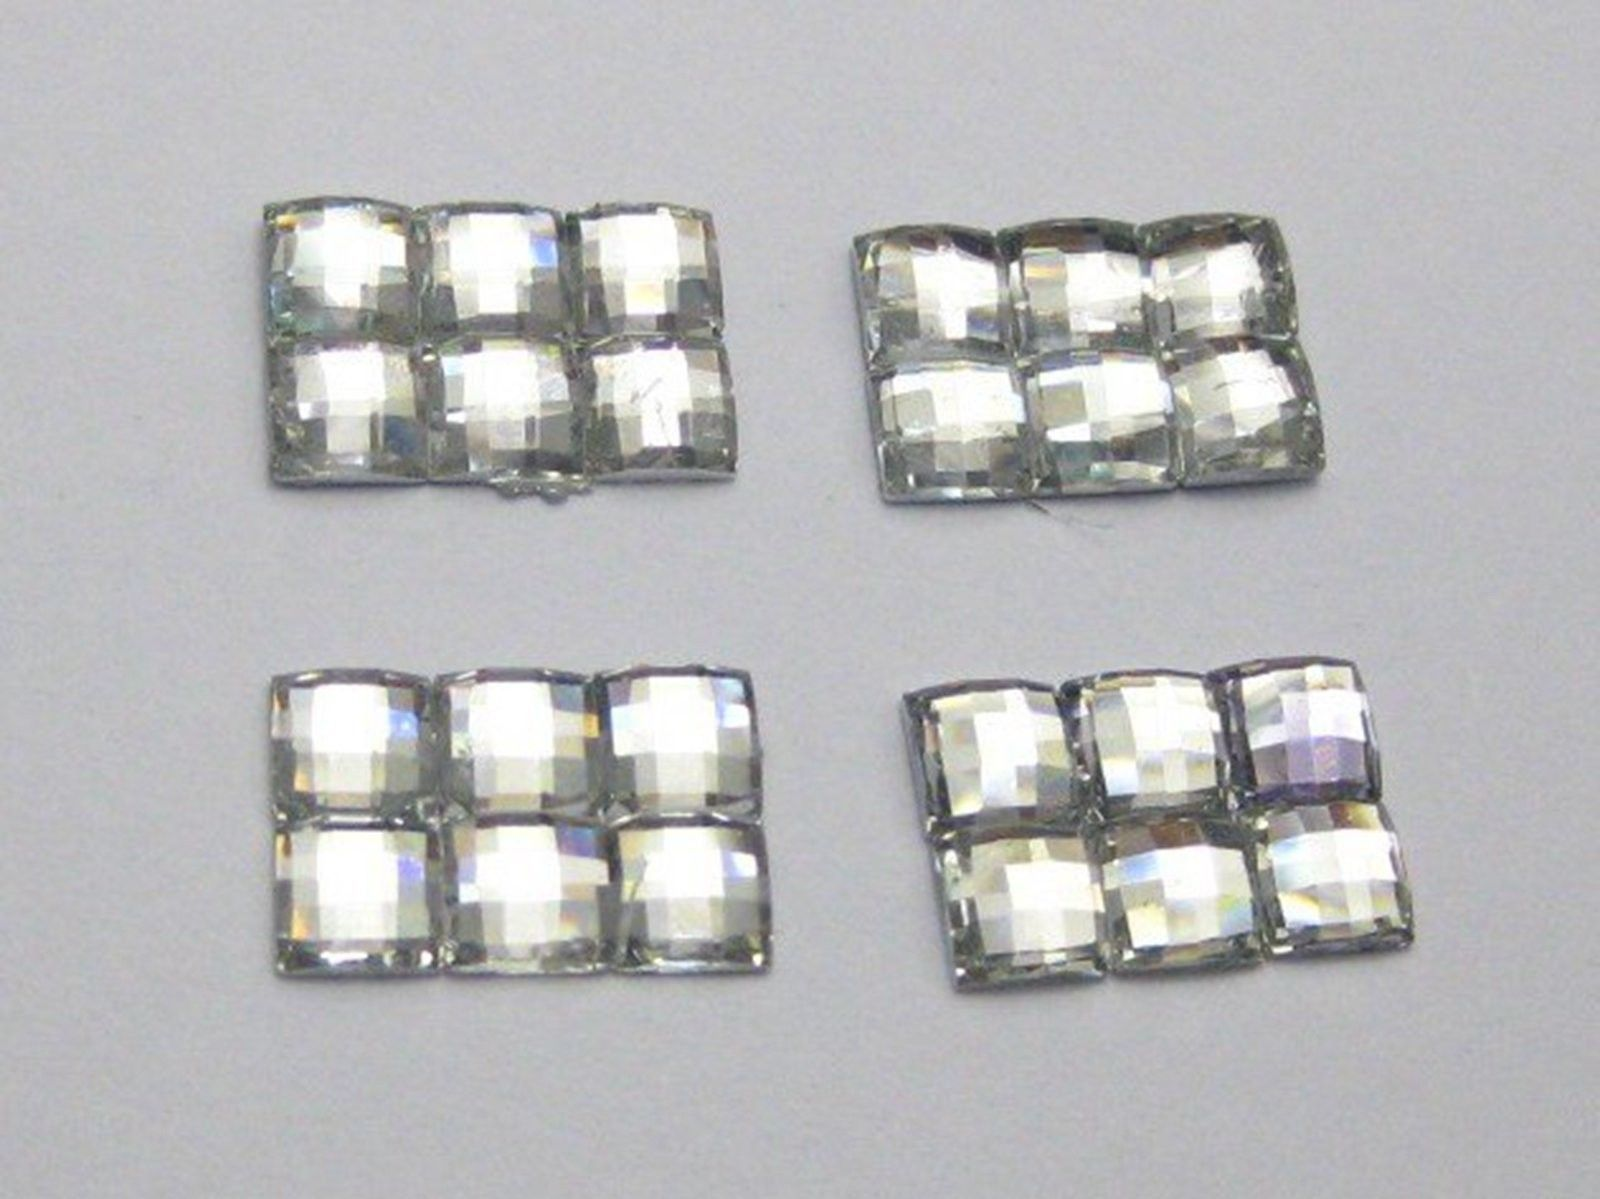 200 Clear Mosaics 4Mm Square Flatback Rectangle Rhinestone Gems 12X8Mm No Hole